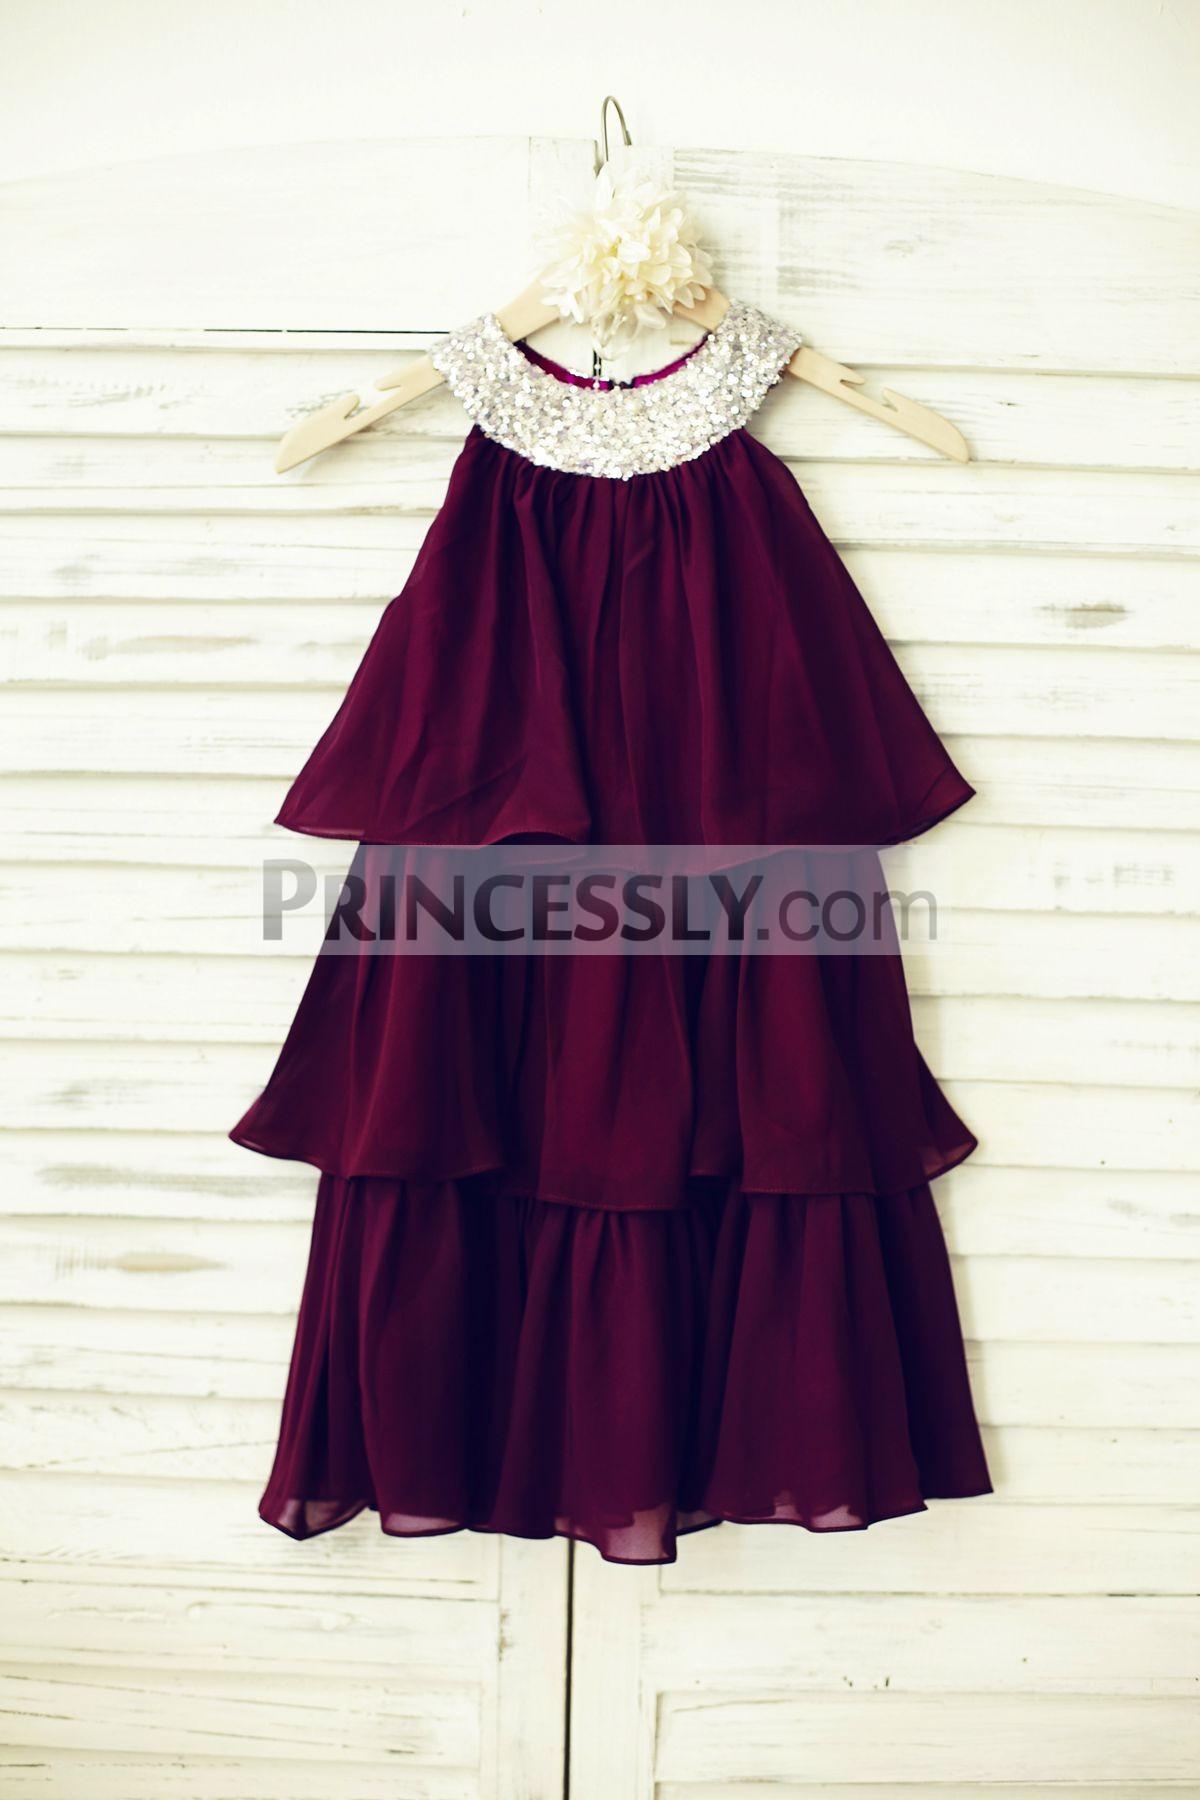 Boho Silver Sequins Purple Plum Chiffon Cupcake Flower Girl Dress